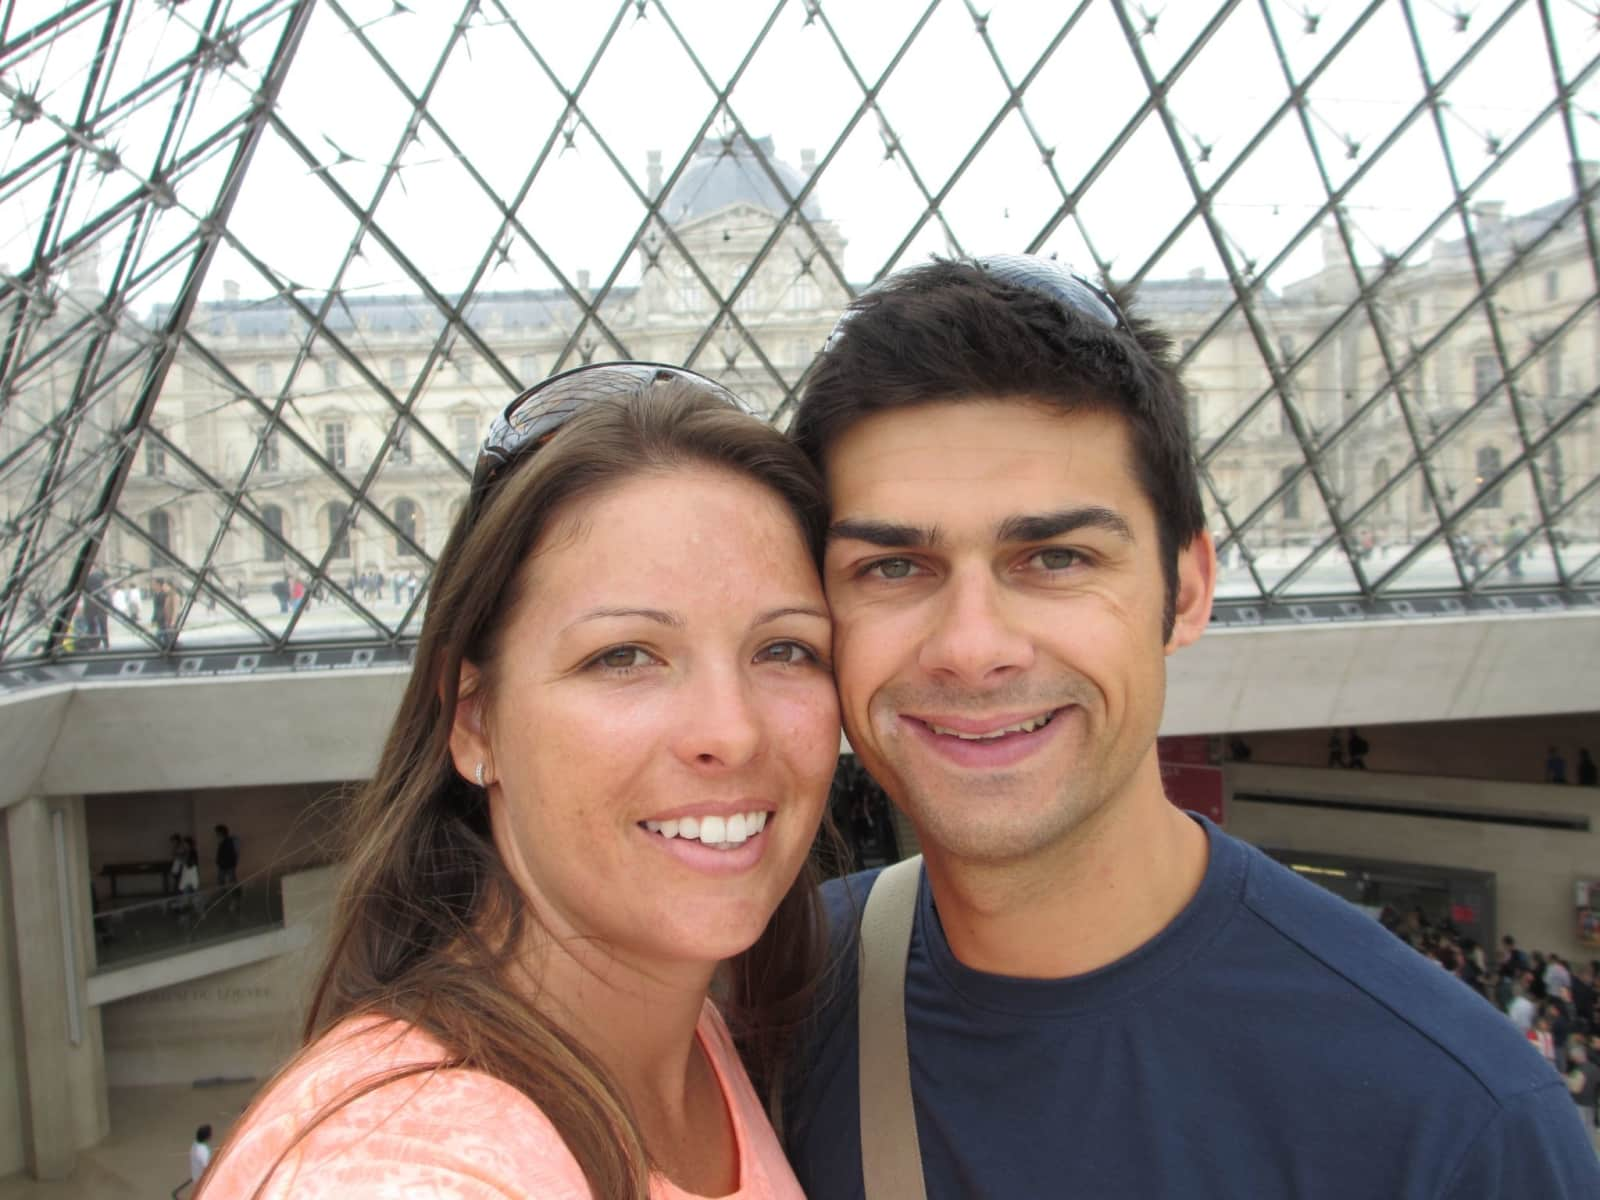 Lesley & Matthew from Canberra, Australian Capital Territory, Australia